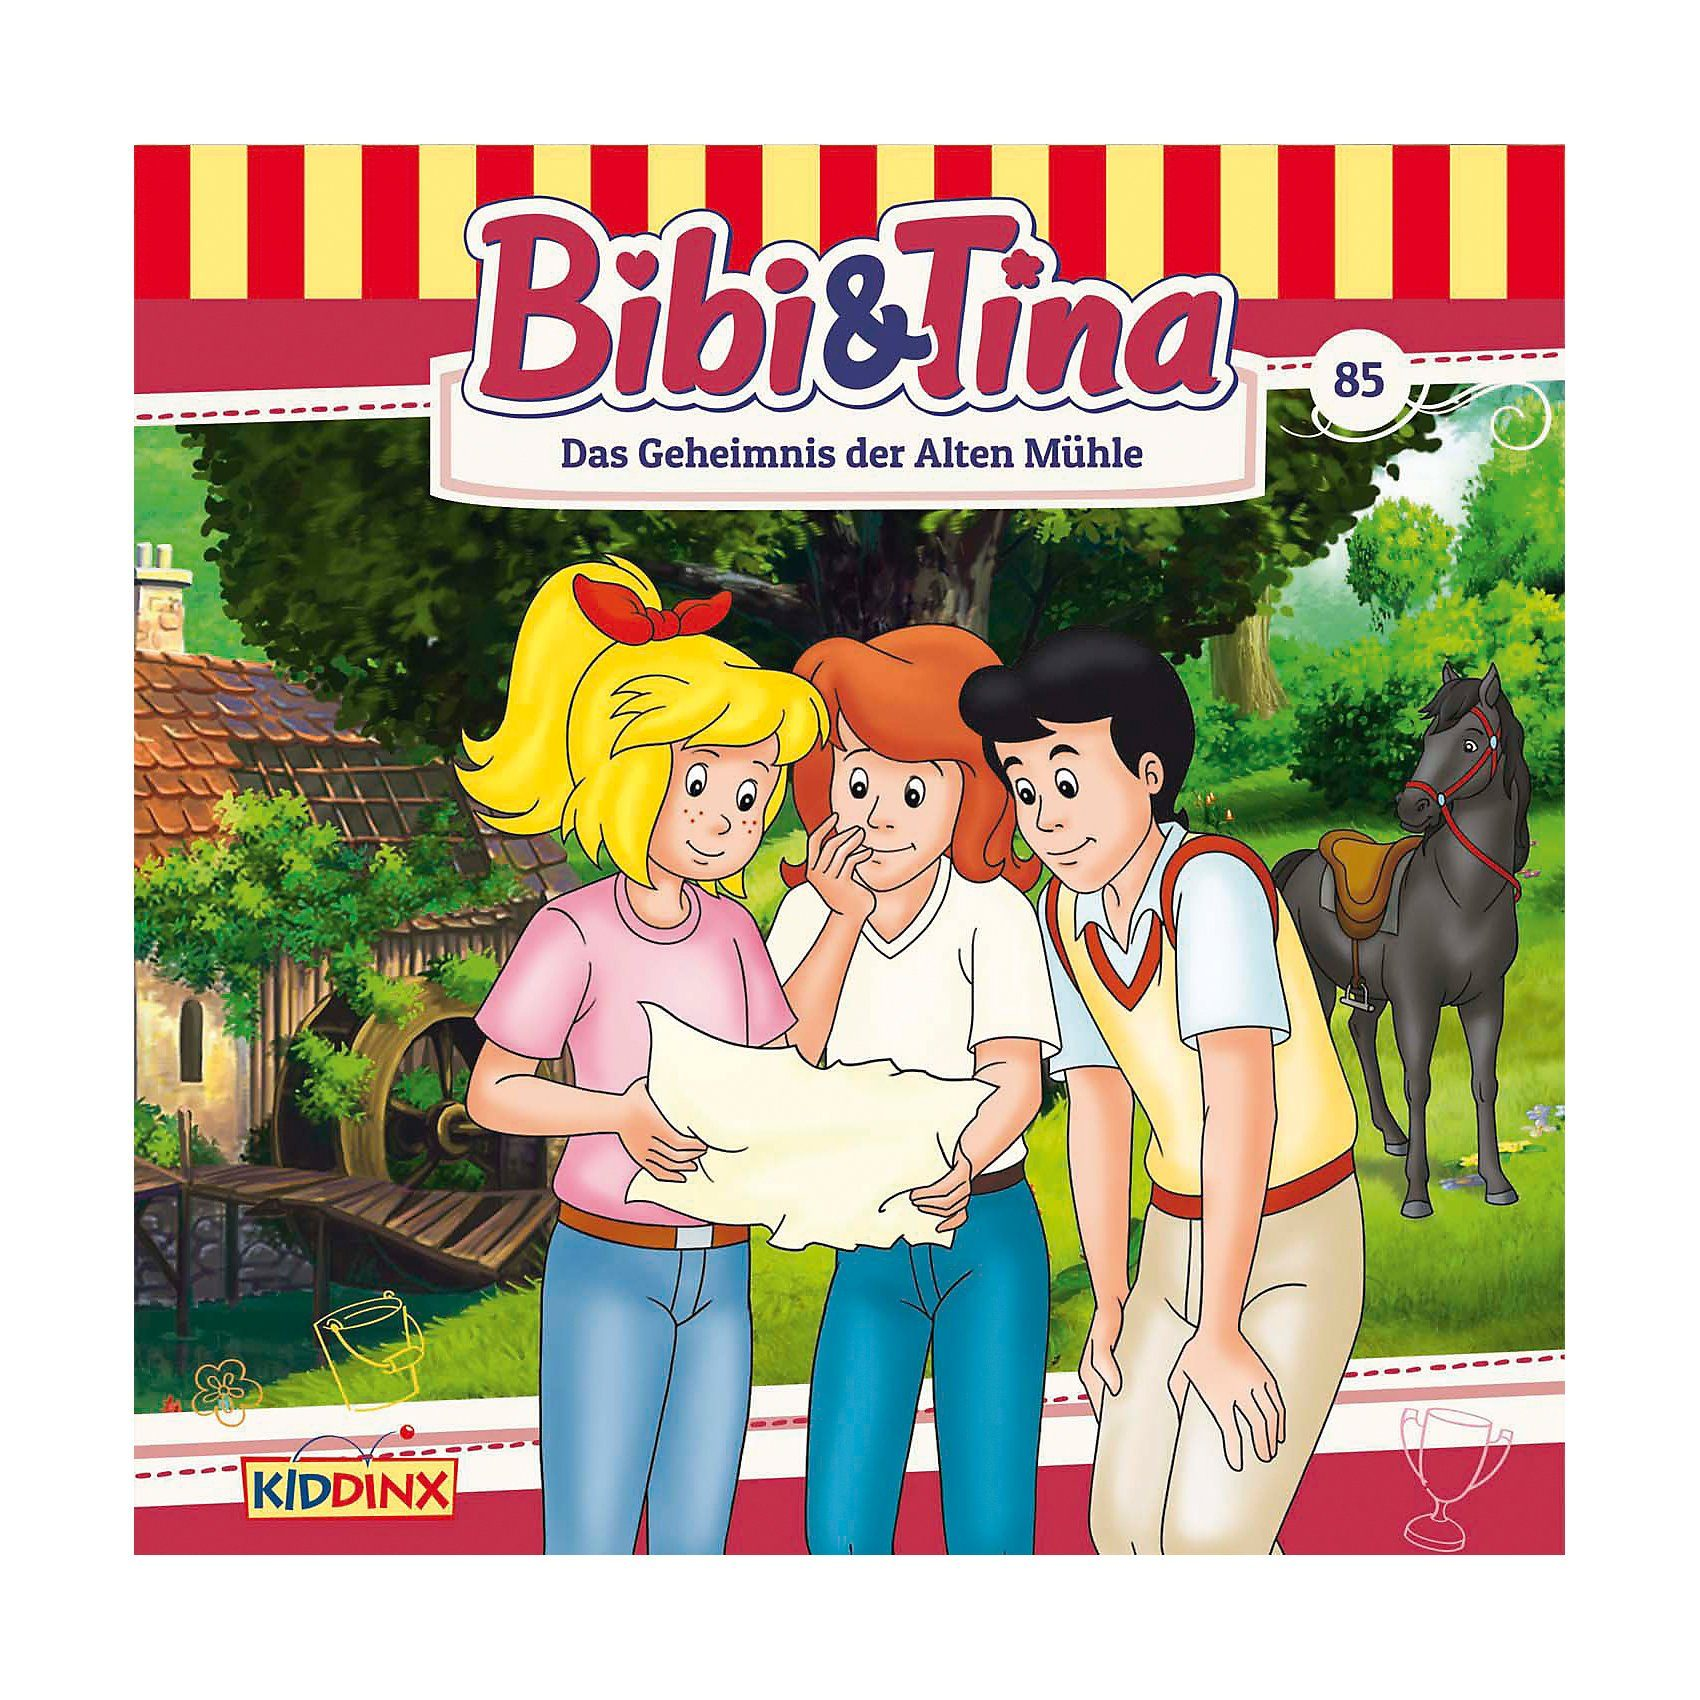 Kiddinx CD Bibi & Tina 85